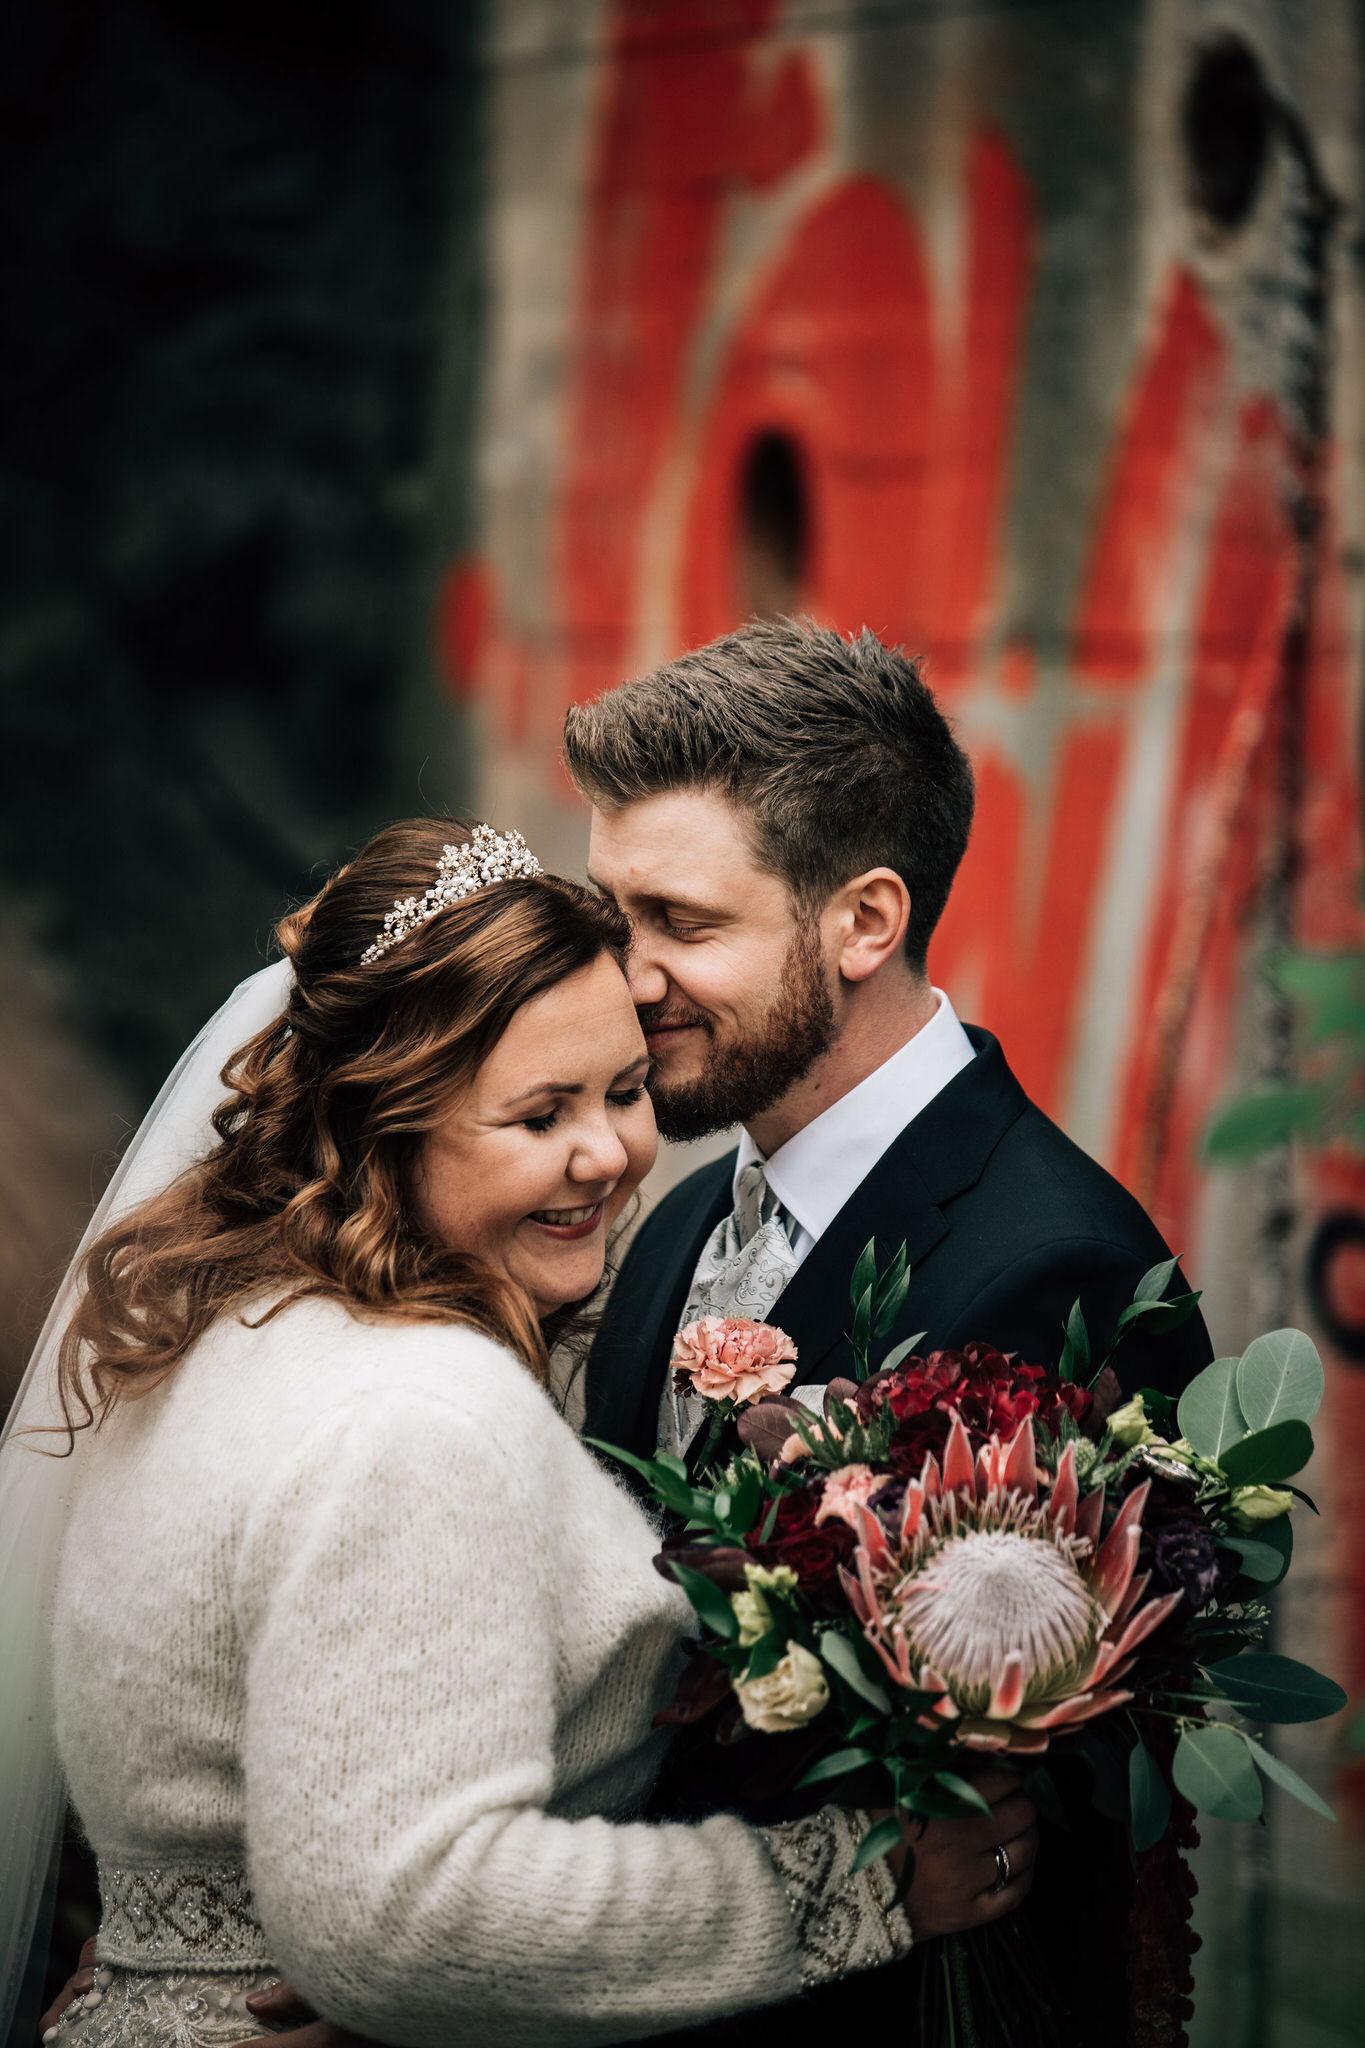 _N857923_fotografering_larvik_bryllup_aspargesgarden_.jpg